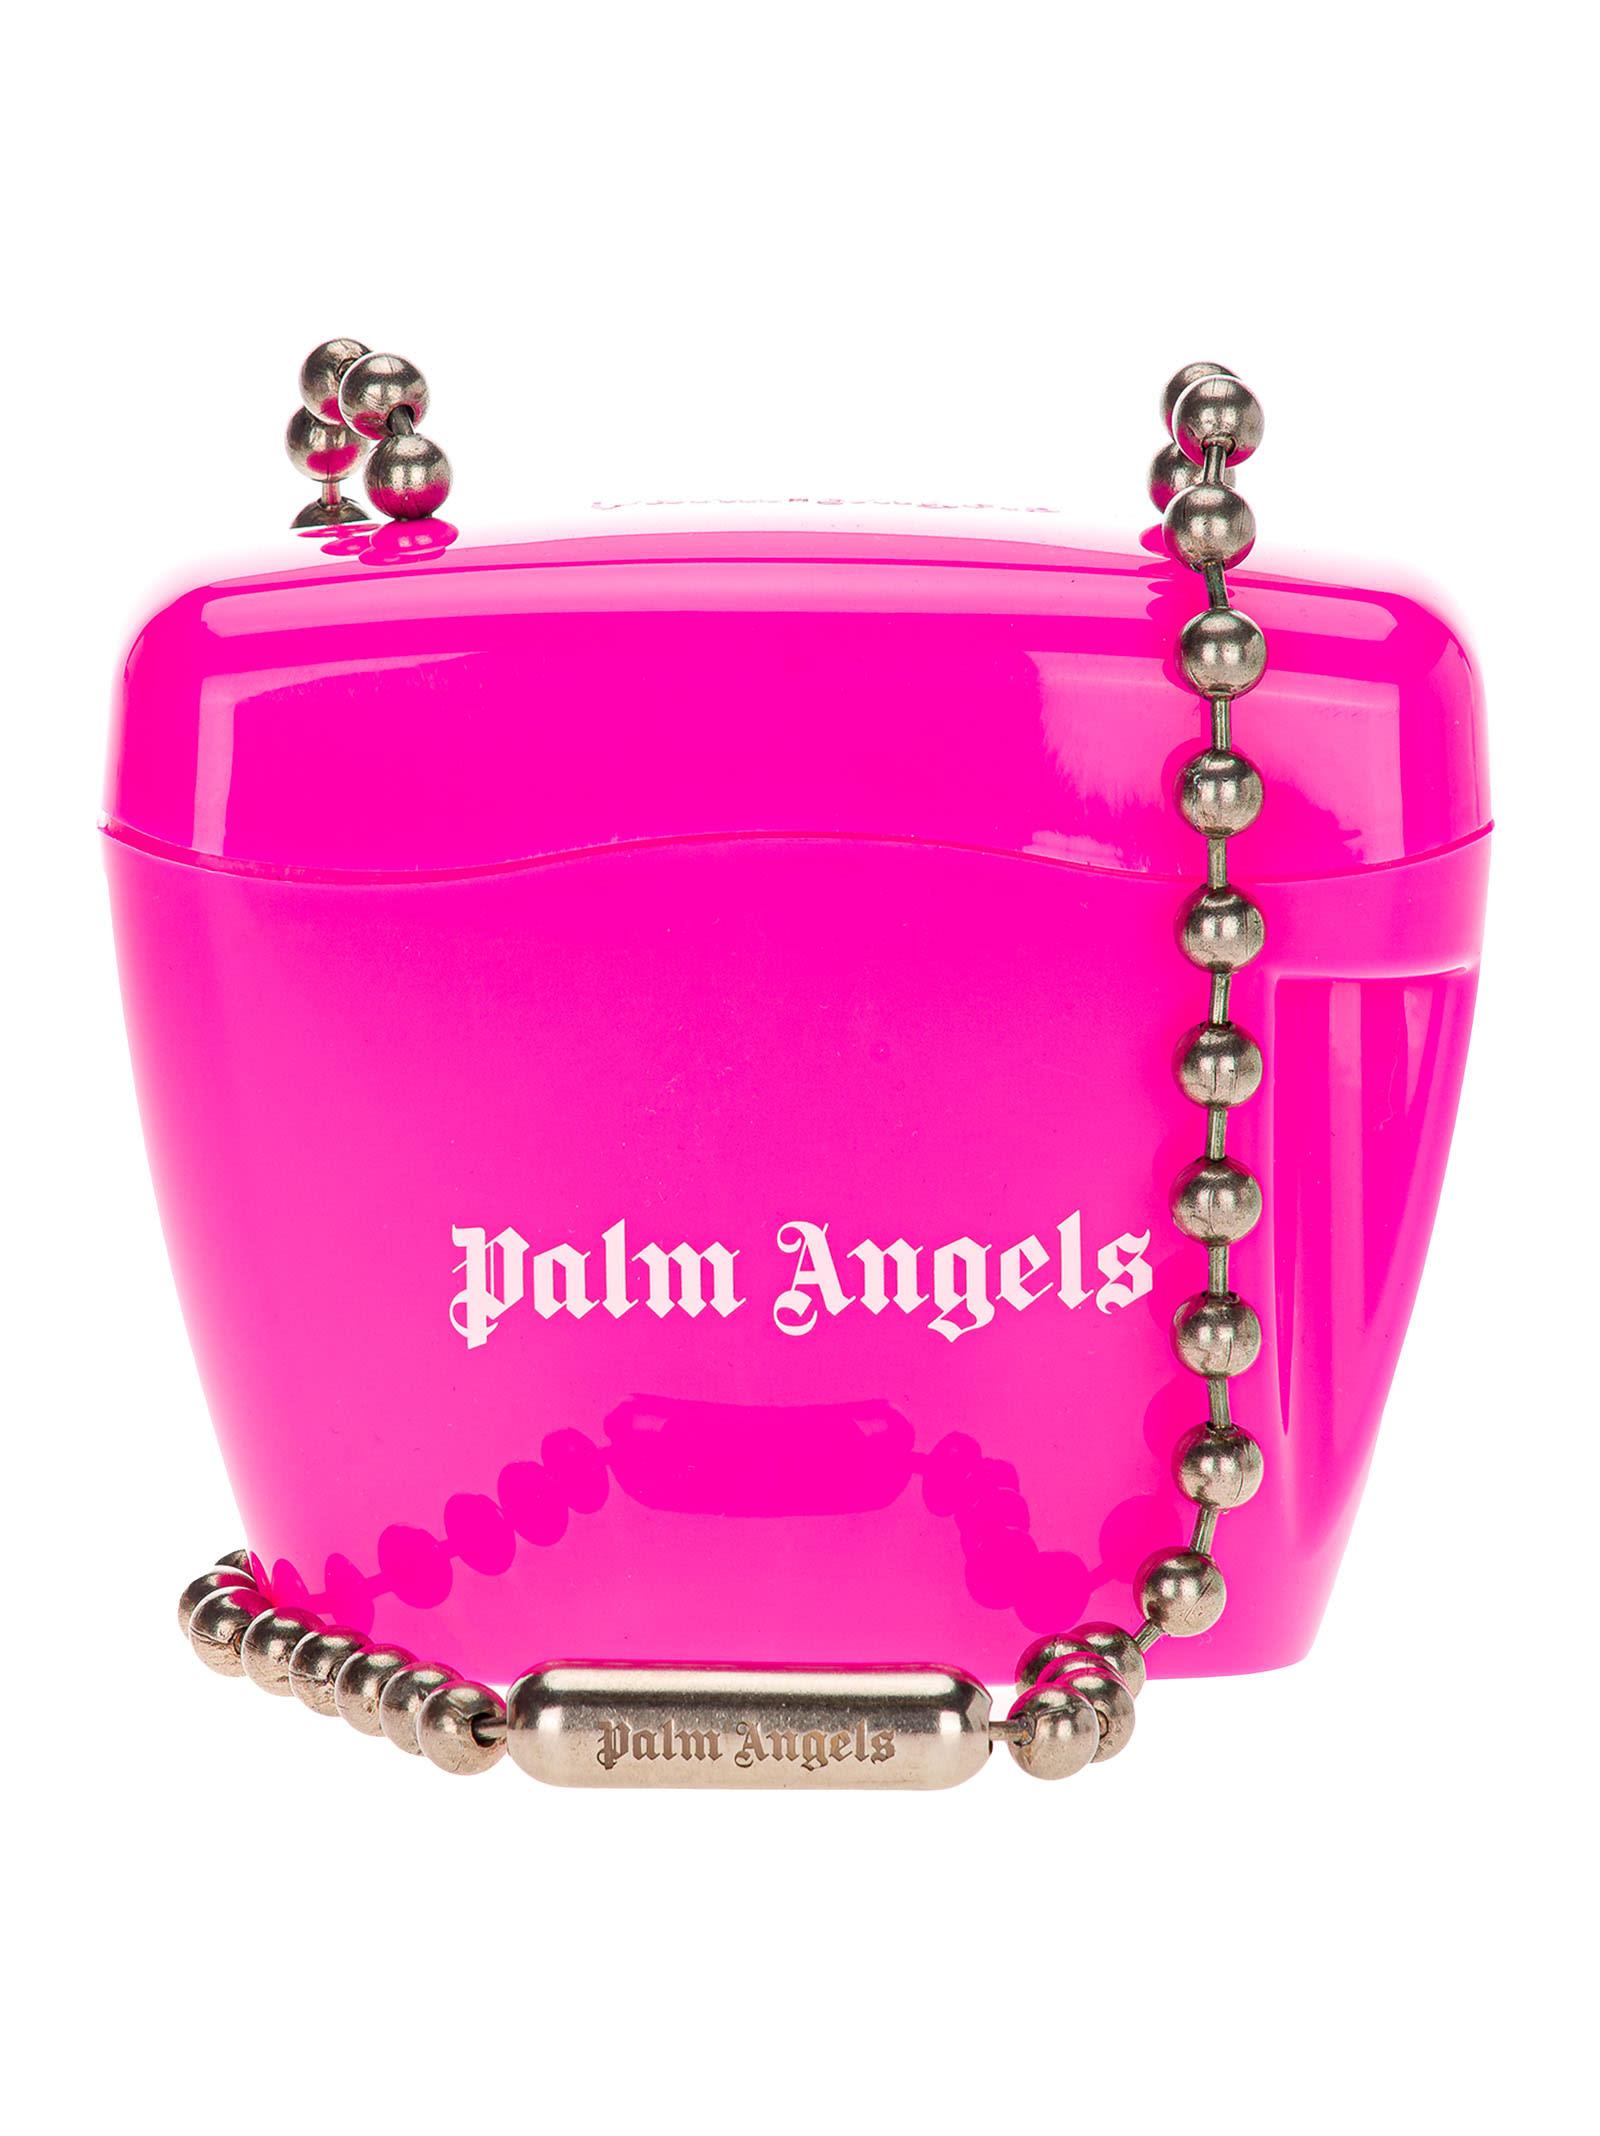 Palm Angels Bags MINI PADLOCK BAG